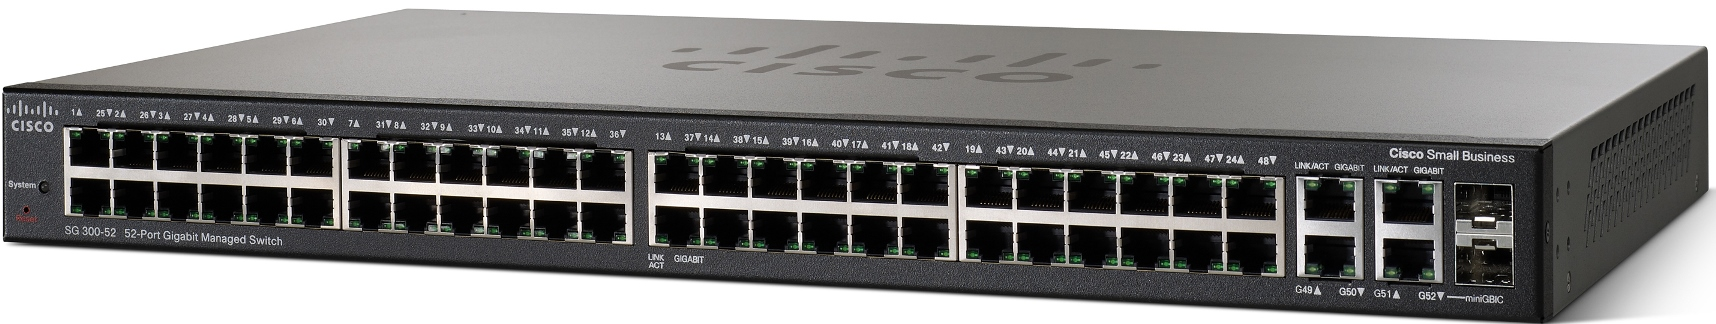 Cisco SRW2048-K9 SG300-52 52-port Gigabit Managed Switch